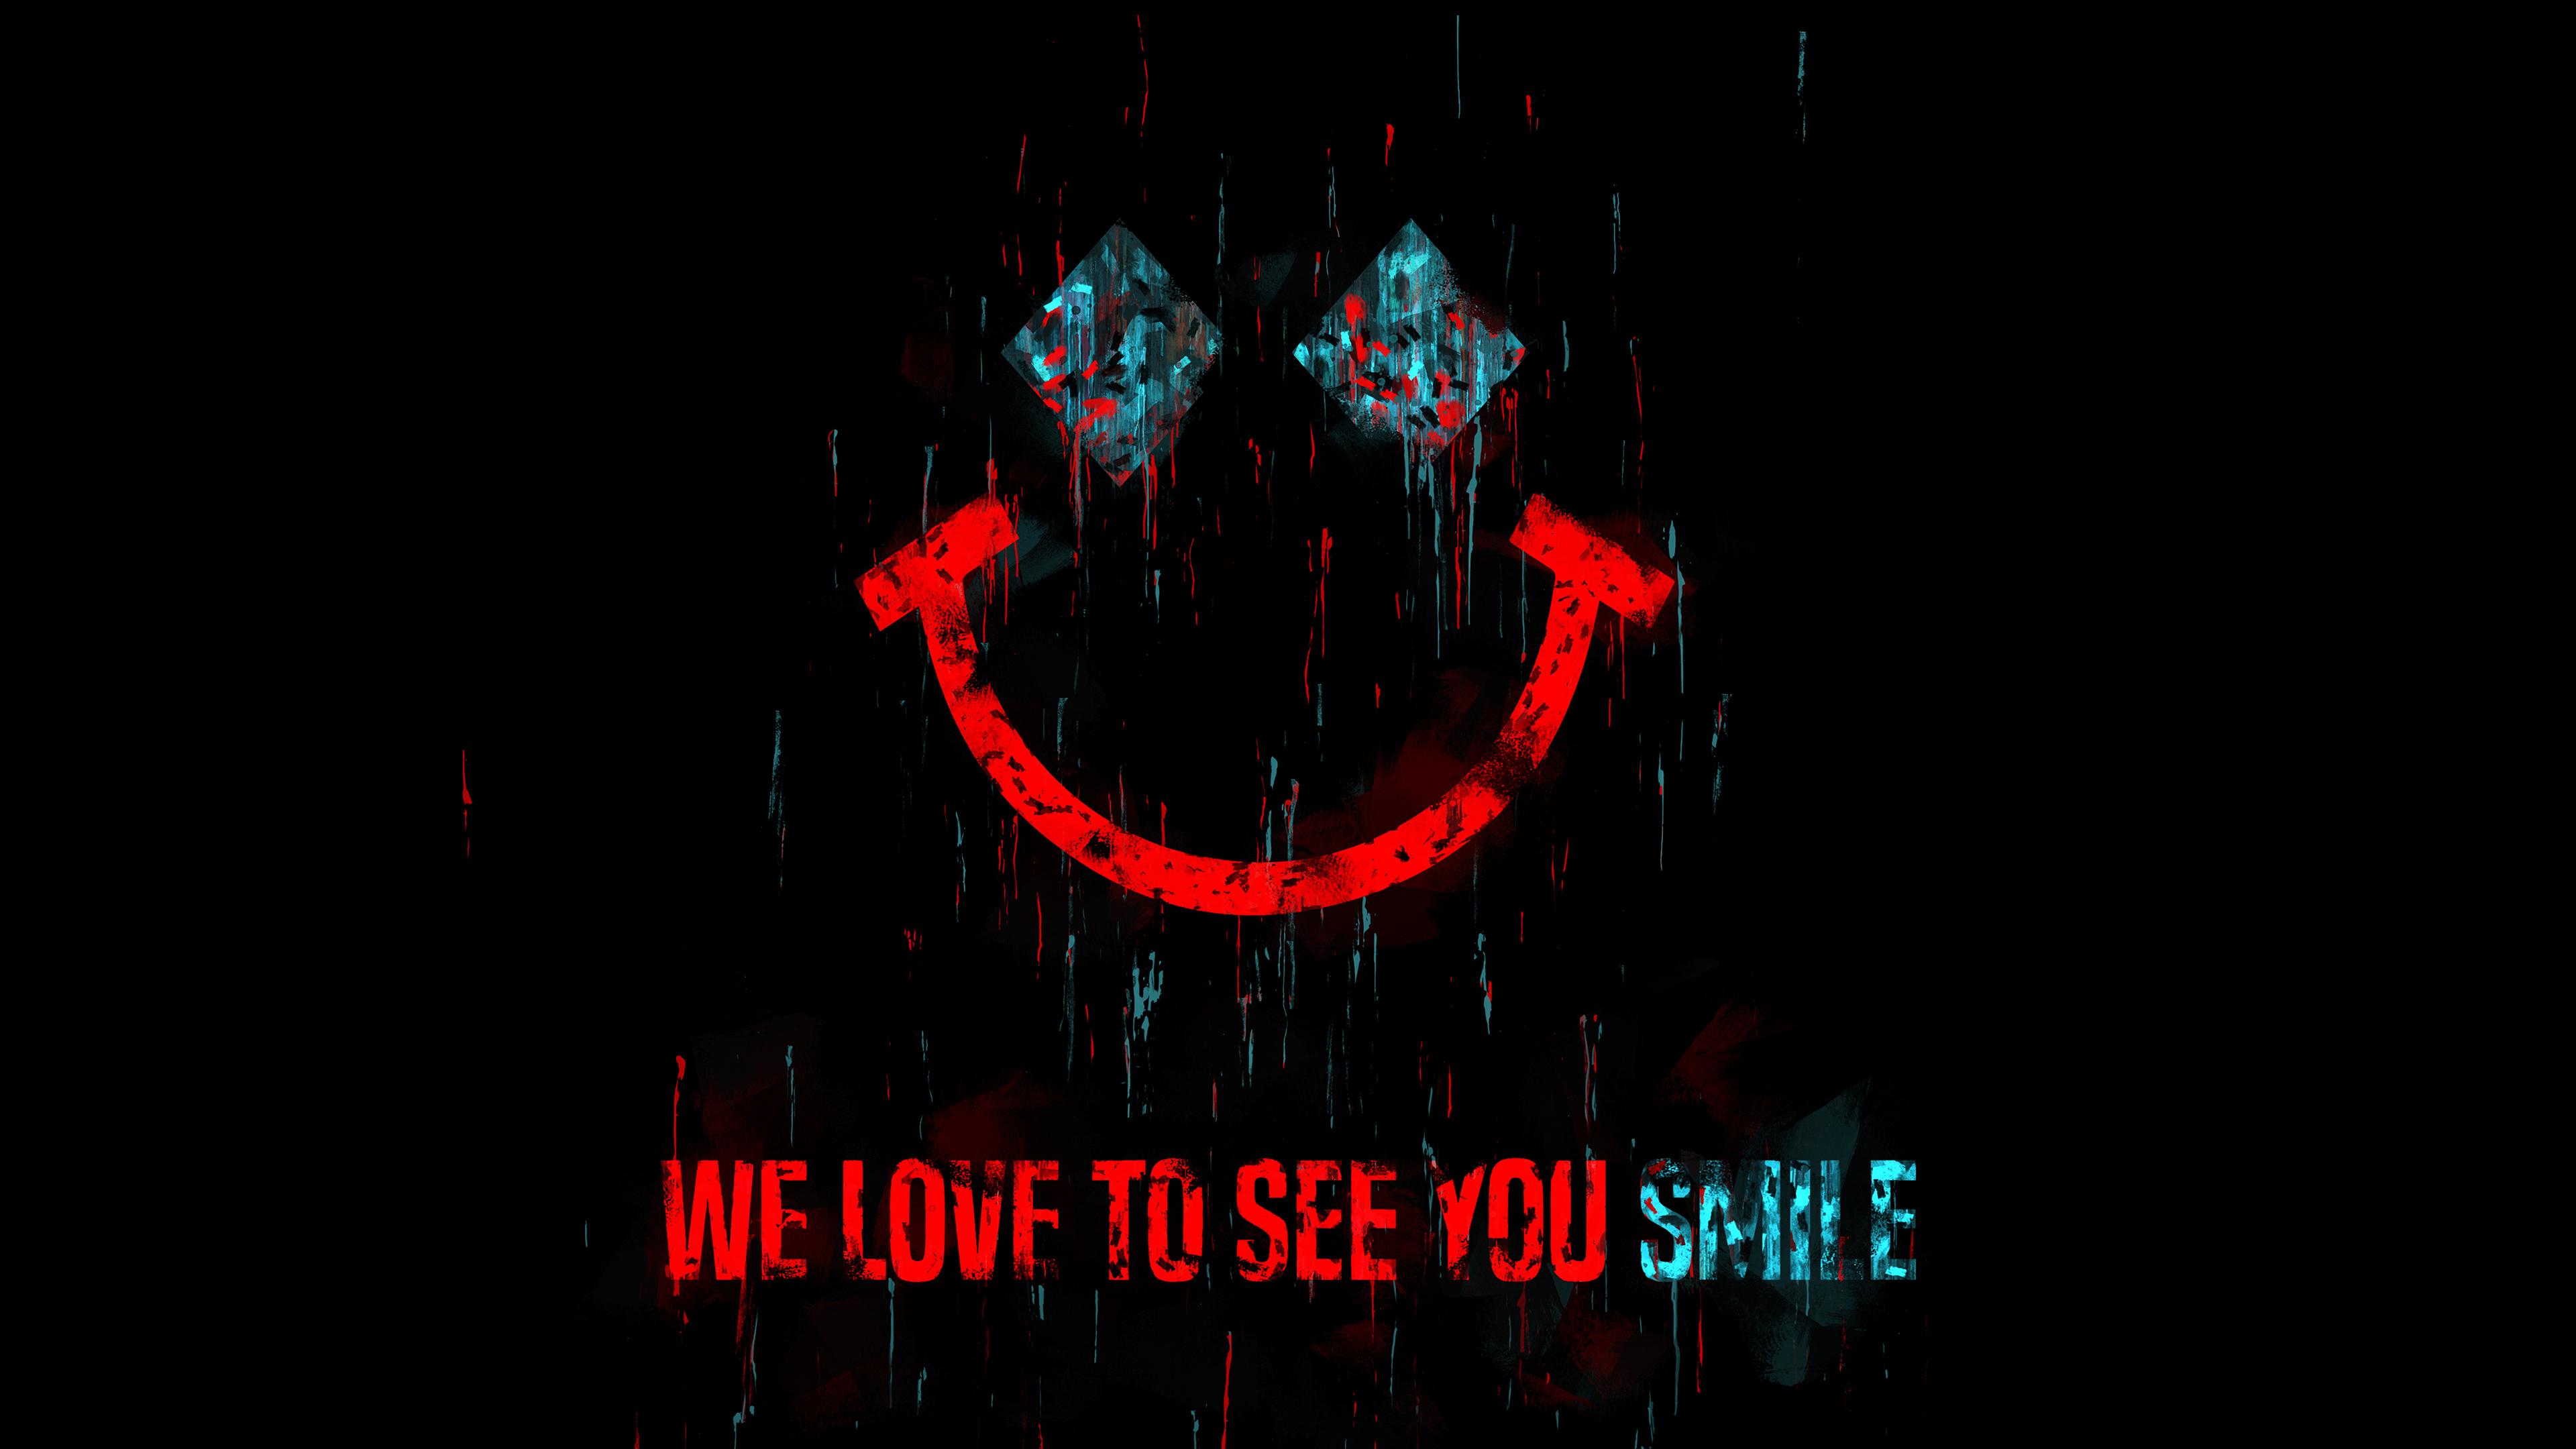 Joker Black Wallpaper Hd 4k Get Images